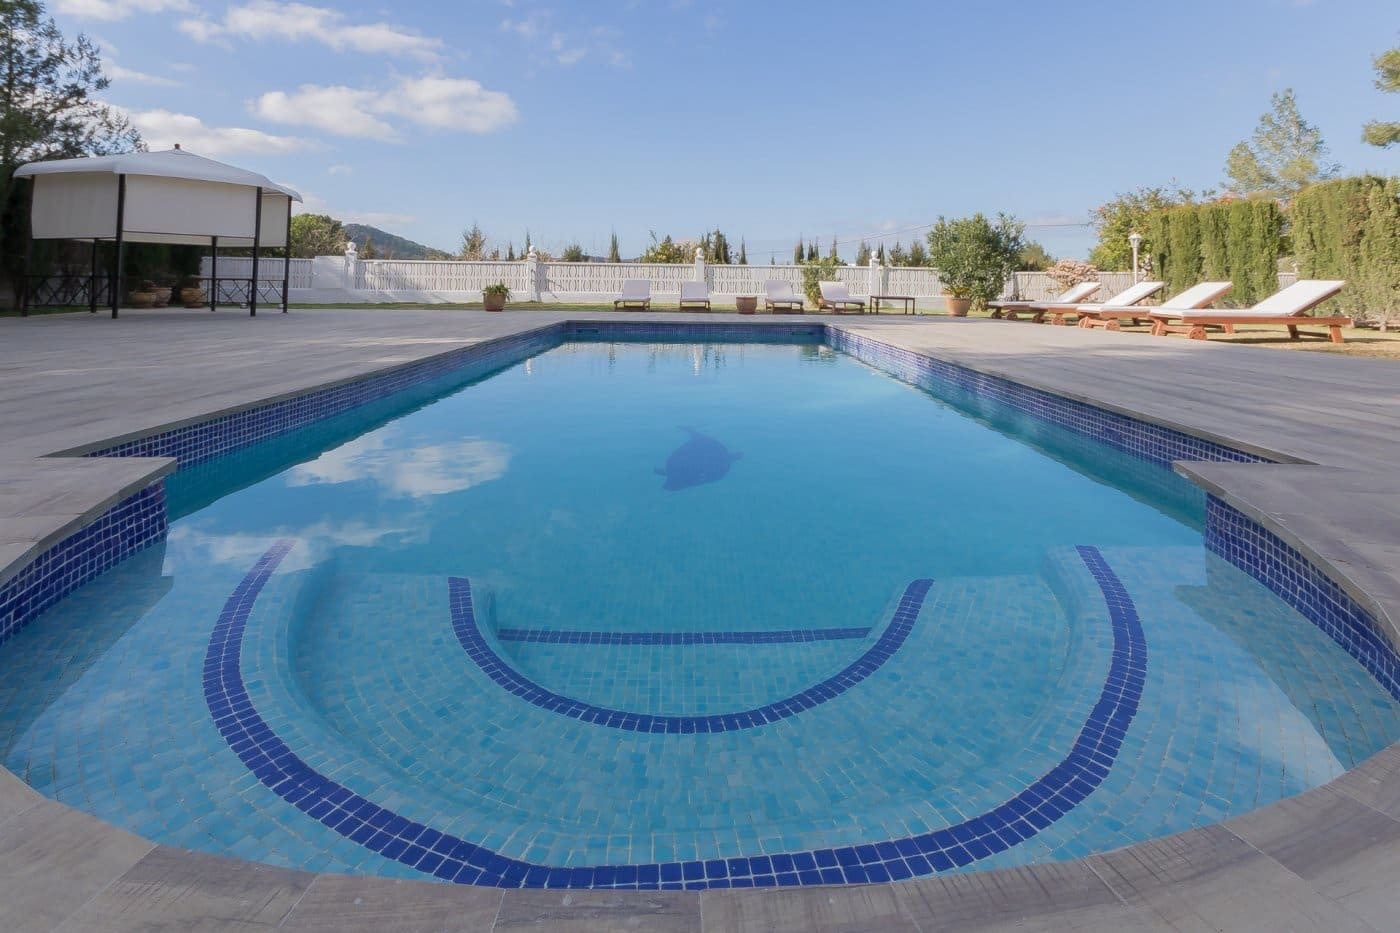 4 bedroom Villa for holiday rental in San Jose / Sant Josep de Sa Talaia with pool - € 3,250 (Ref: 4461656)